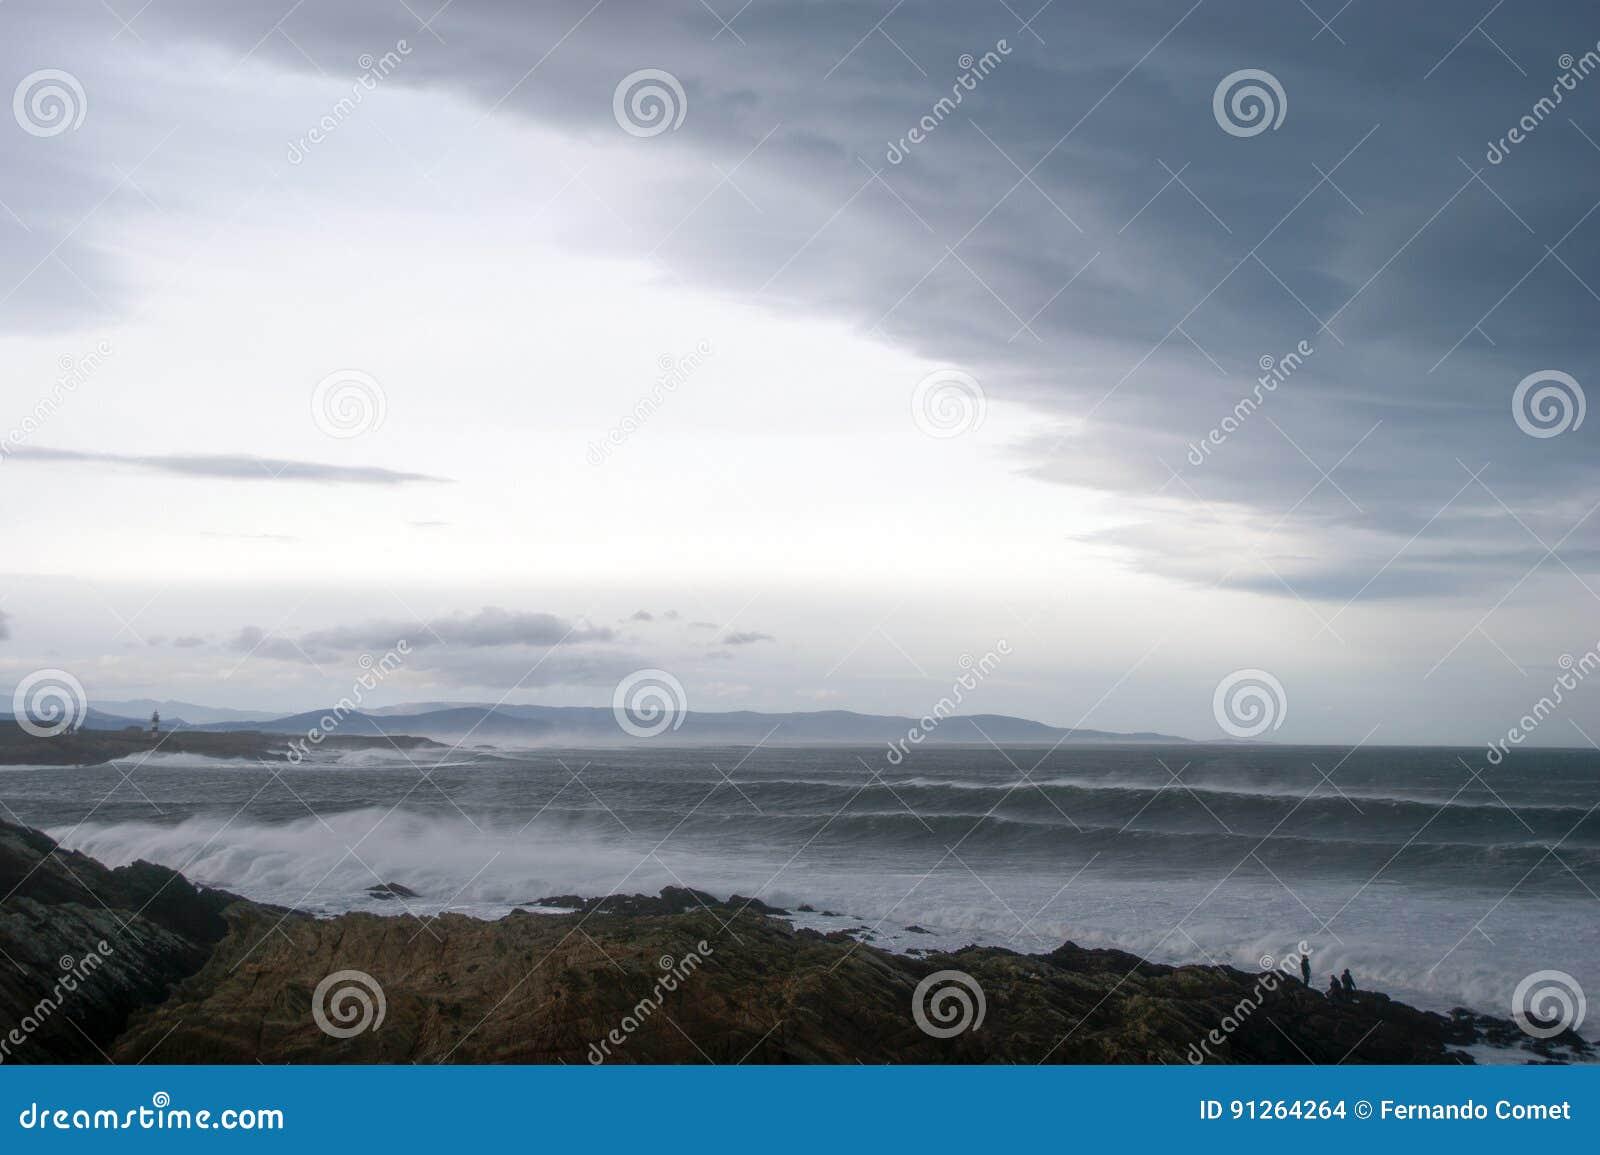 Zwaar windonweer in Galicië en Asturias